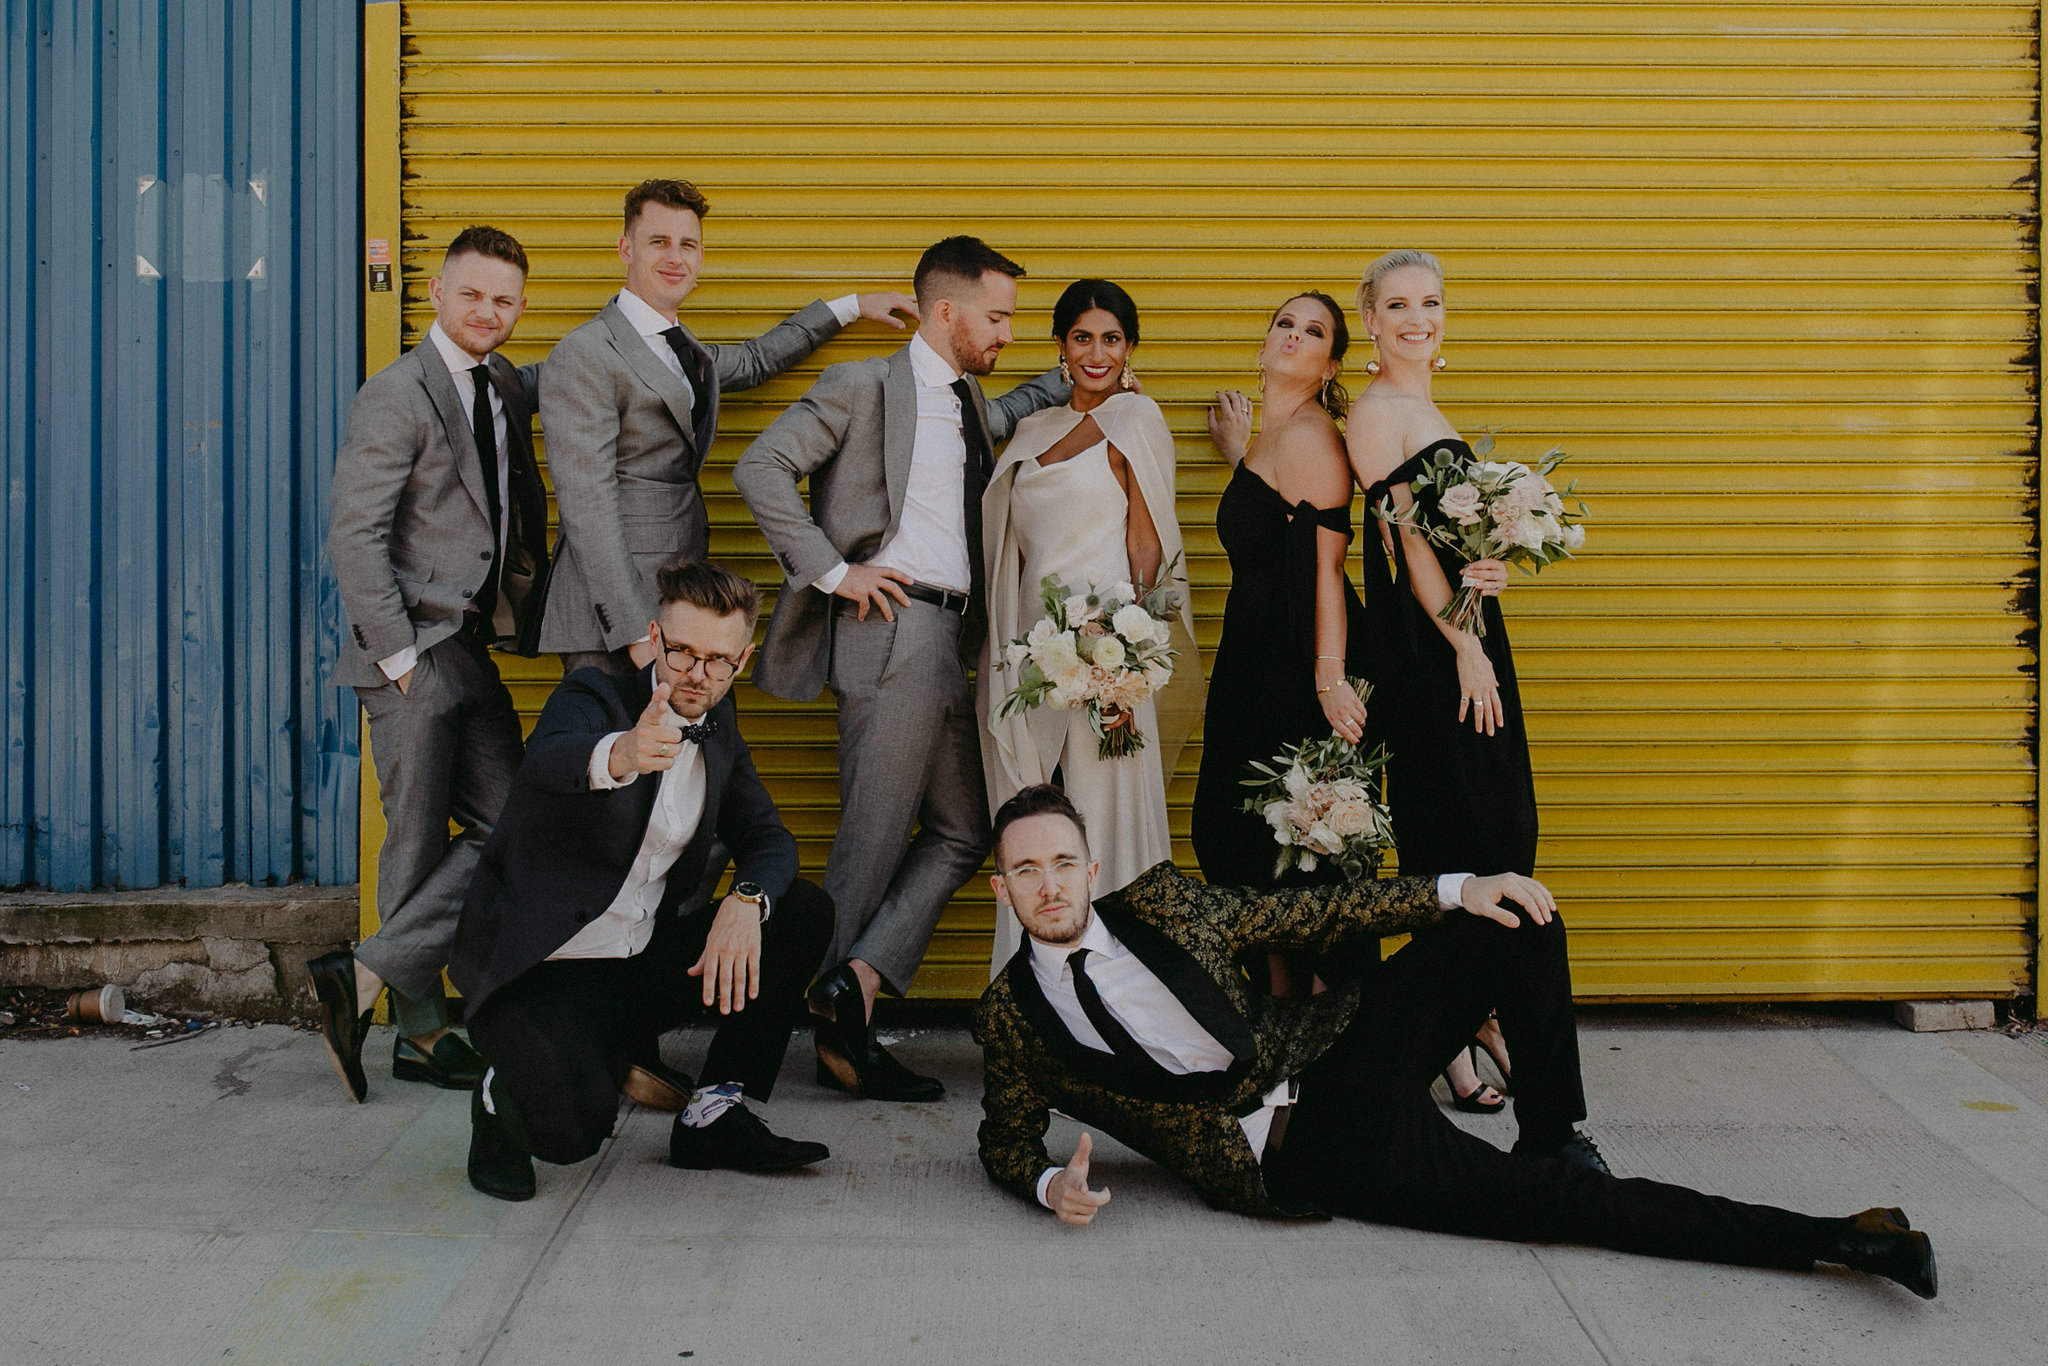 MY_MOON_WILLIAMSBURG_WEDDING-377.jpg